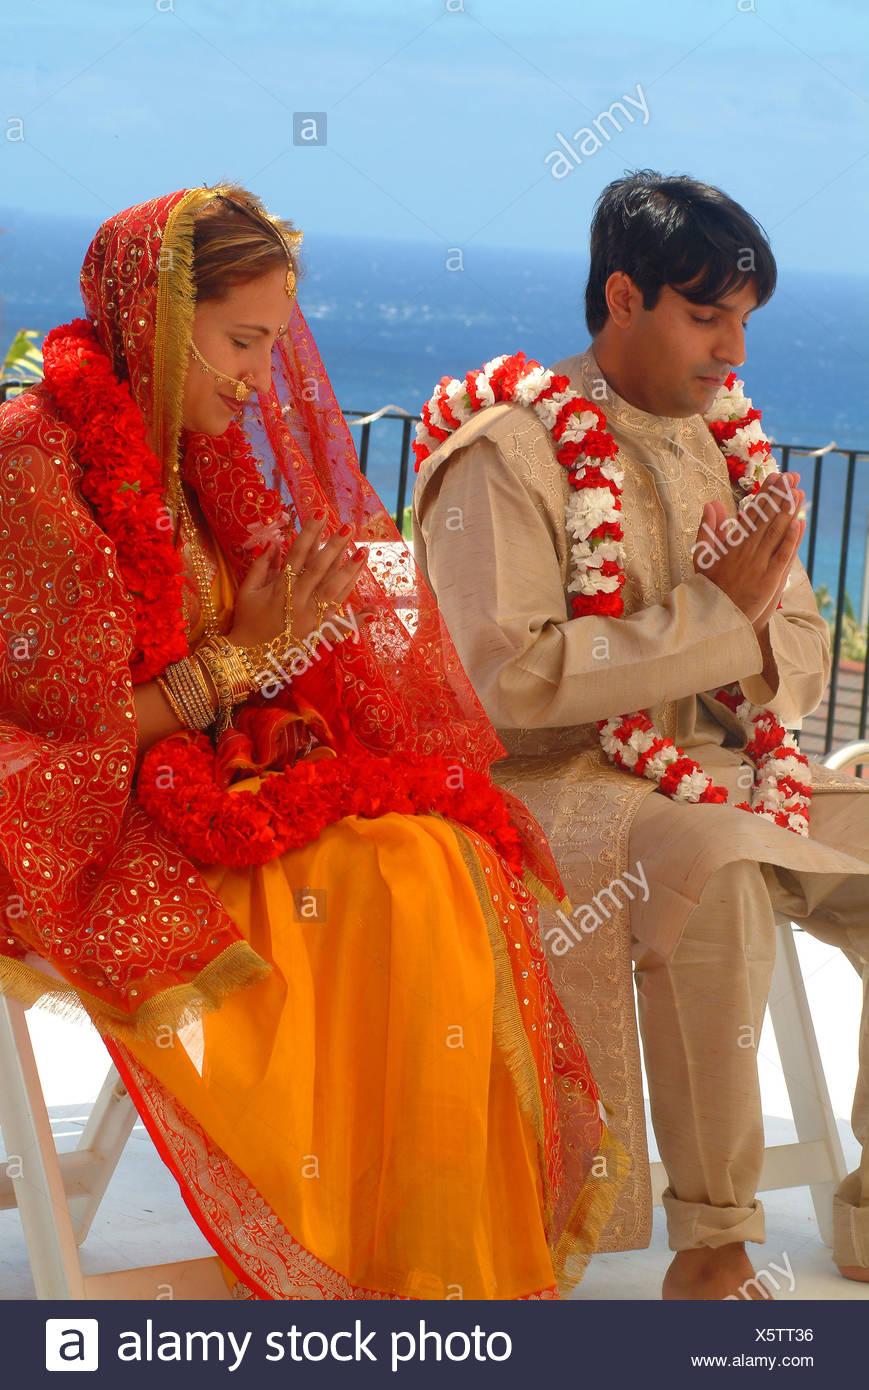 Indian Wedding Bride Groom Stock Photos & Indian Wedding Bride Groom